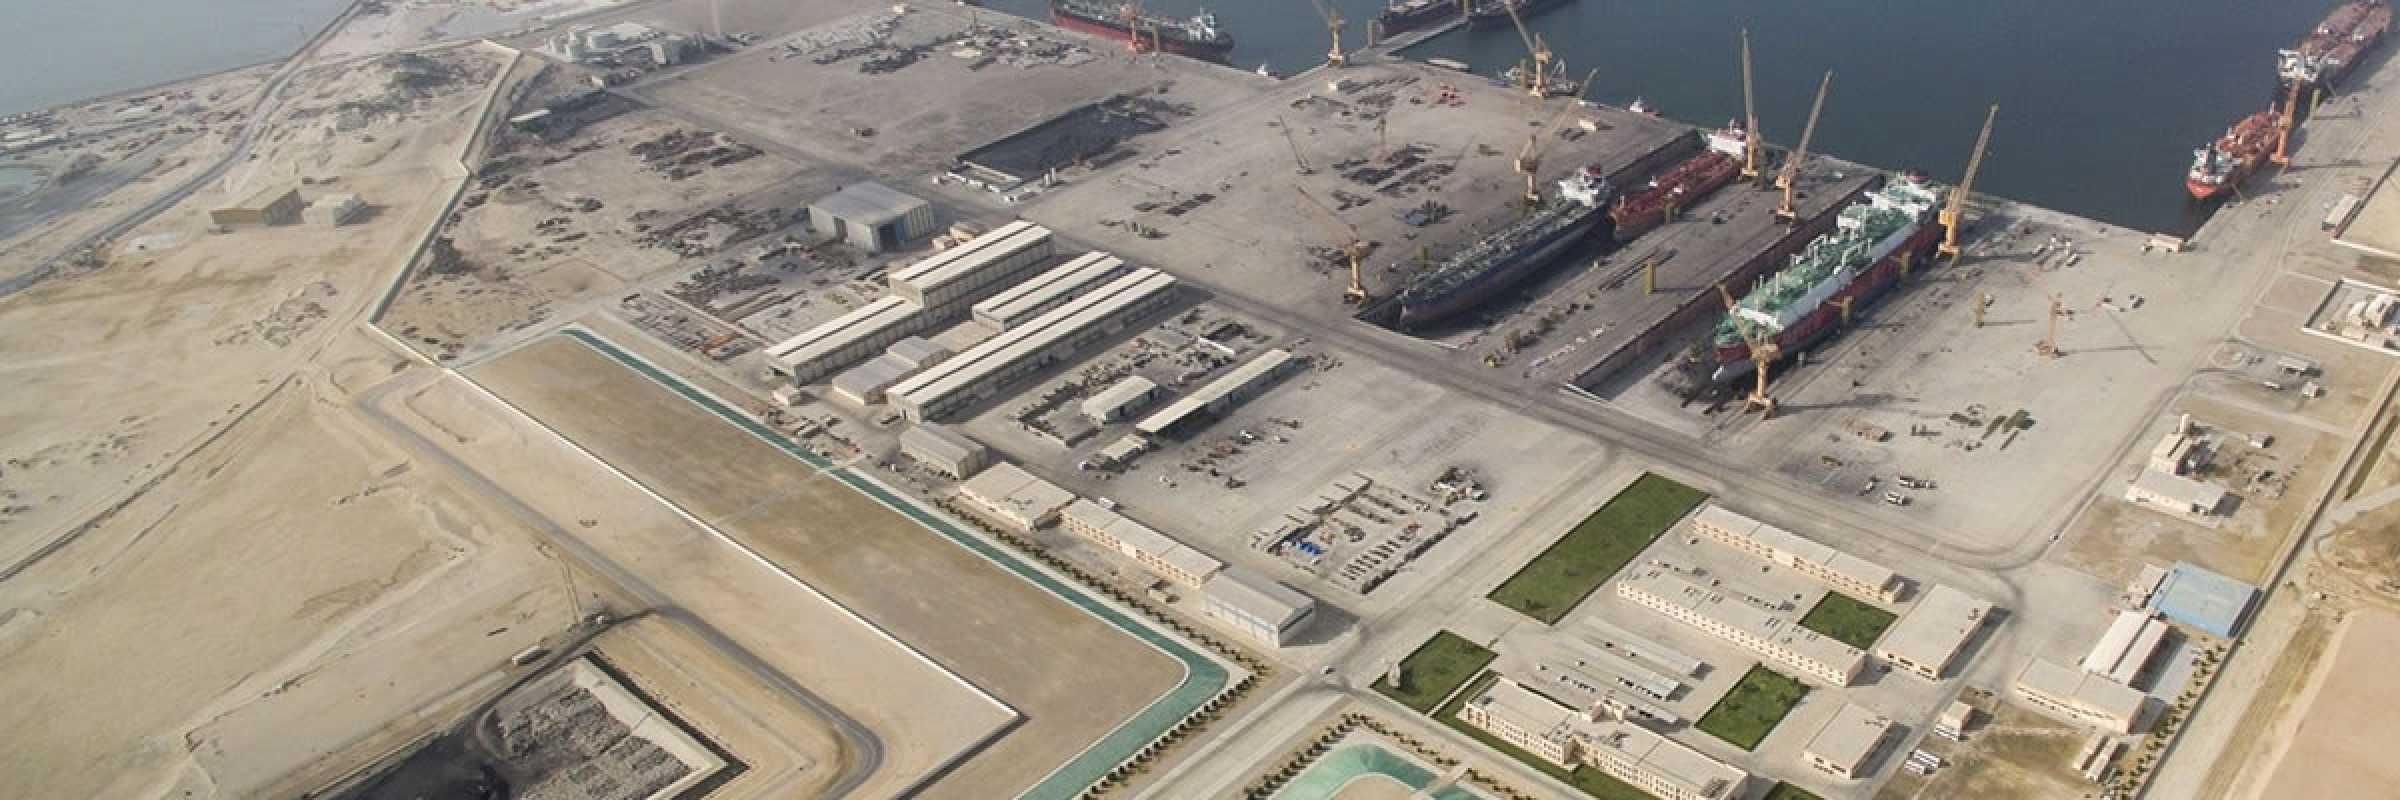 Oman Drydock Company to share visionary plans at Posidonia